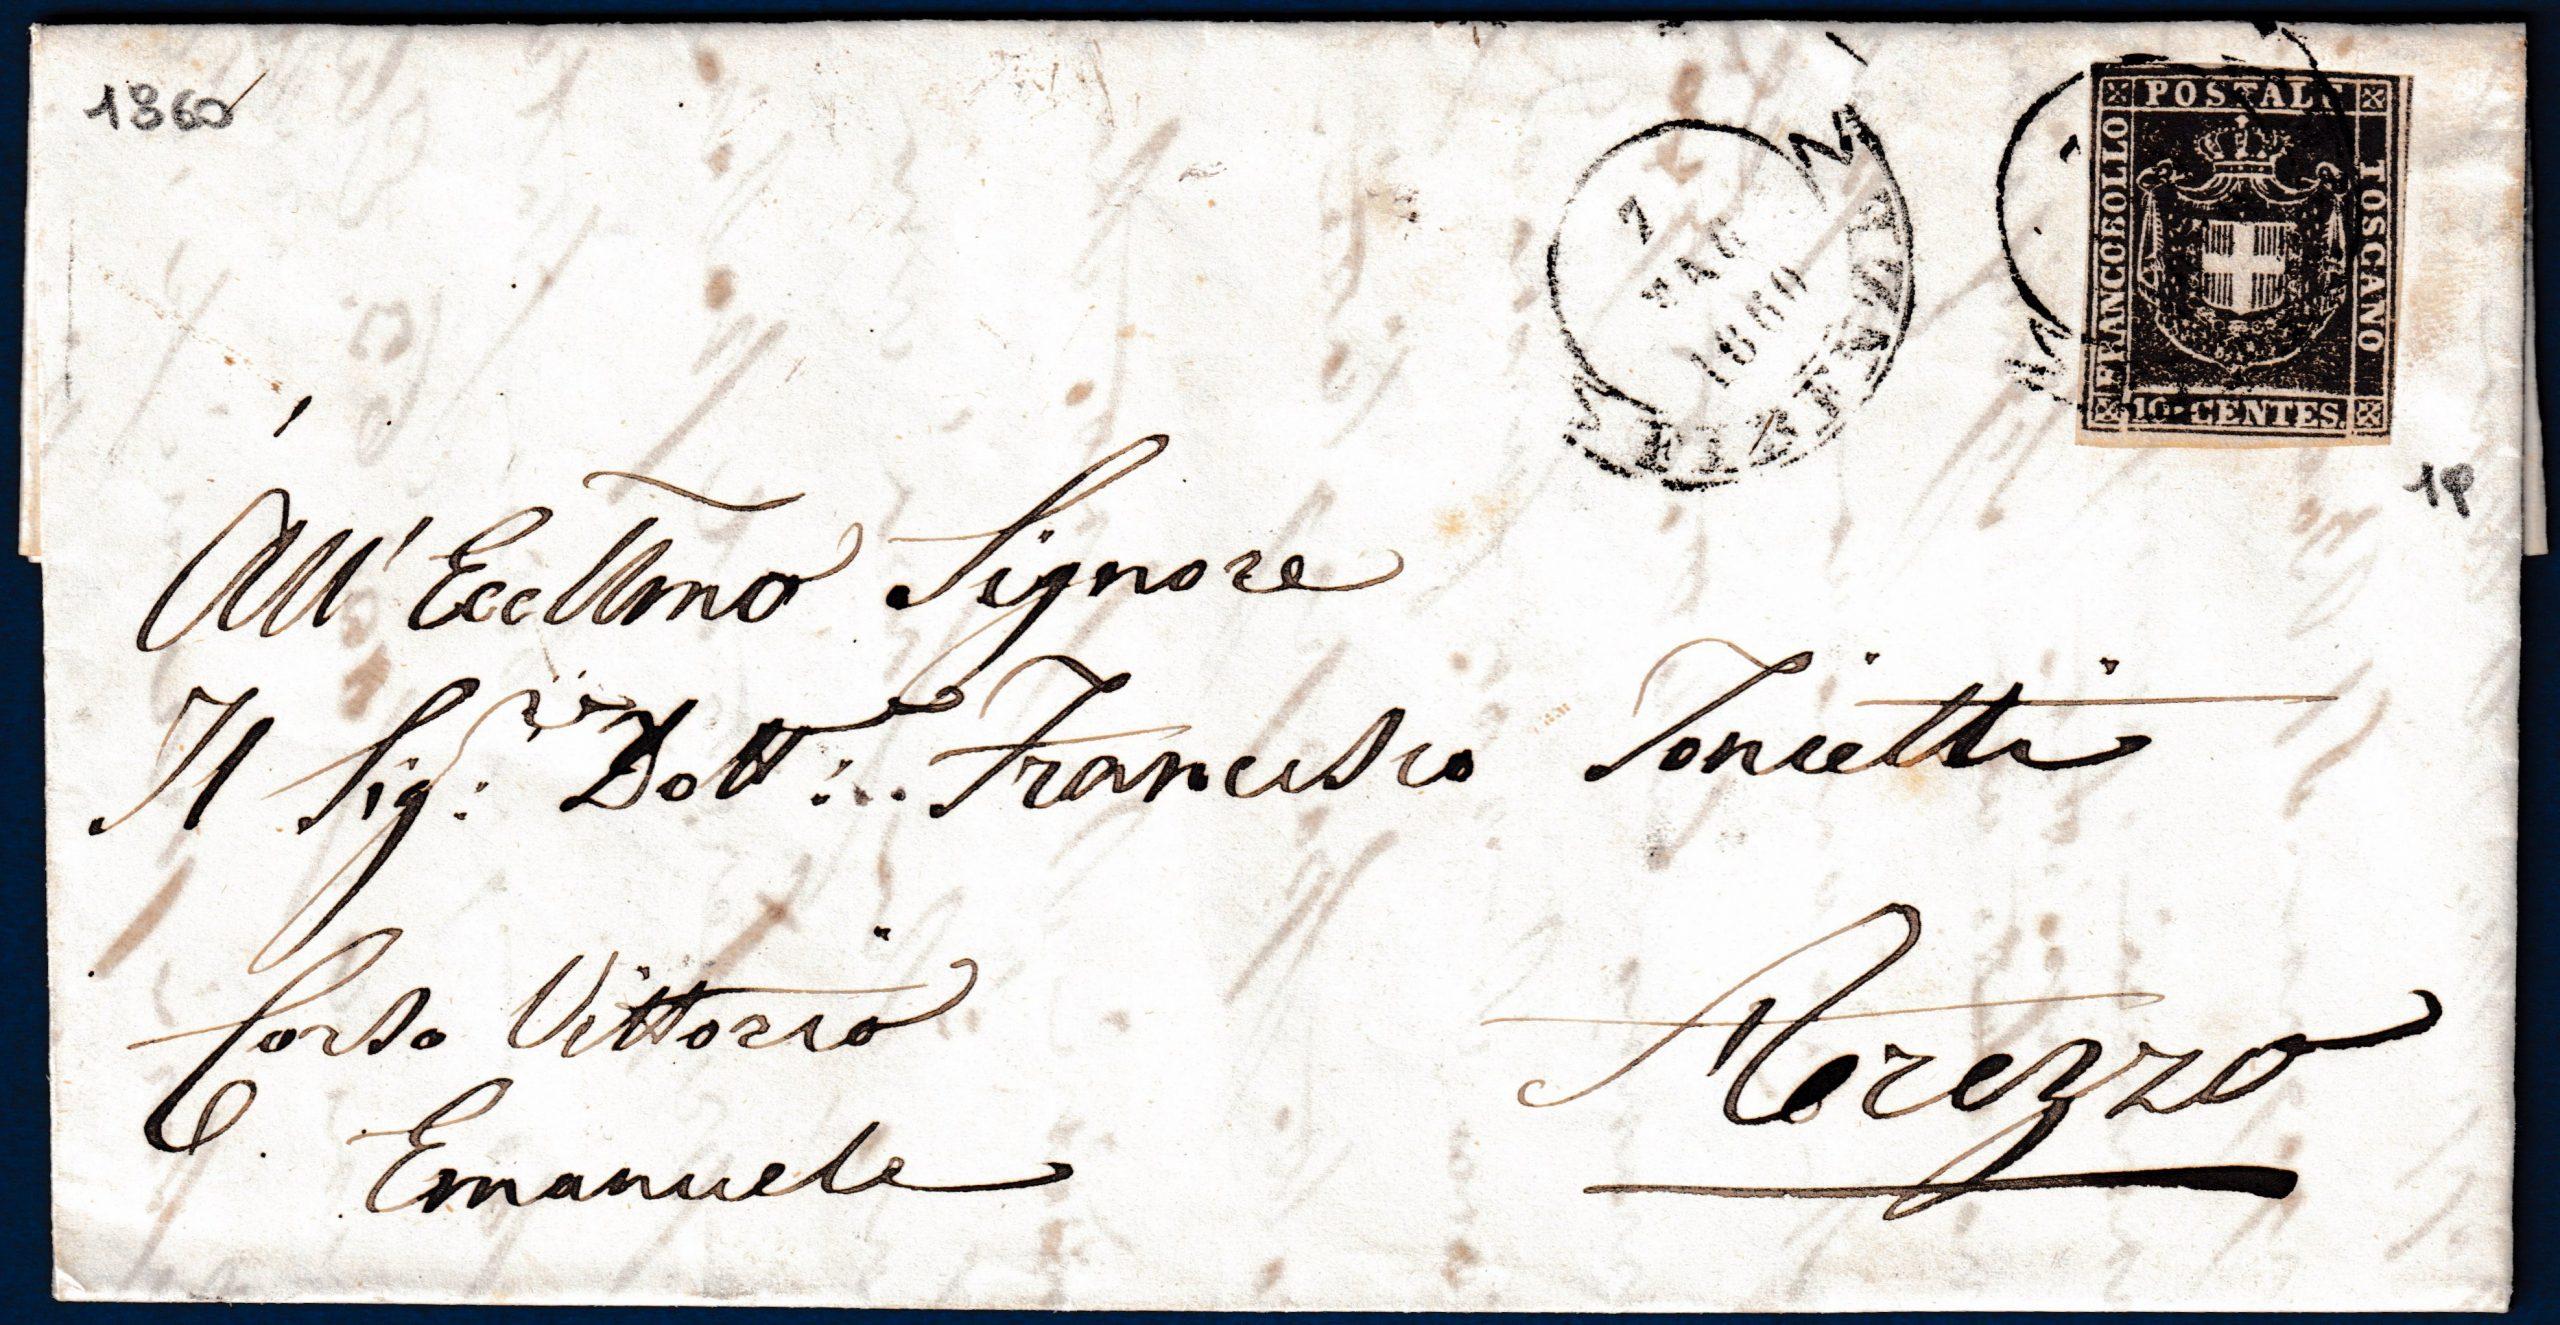 1860 - Toscana - Lettera resa franca con cent.10